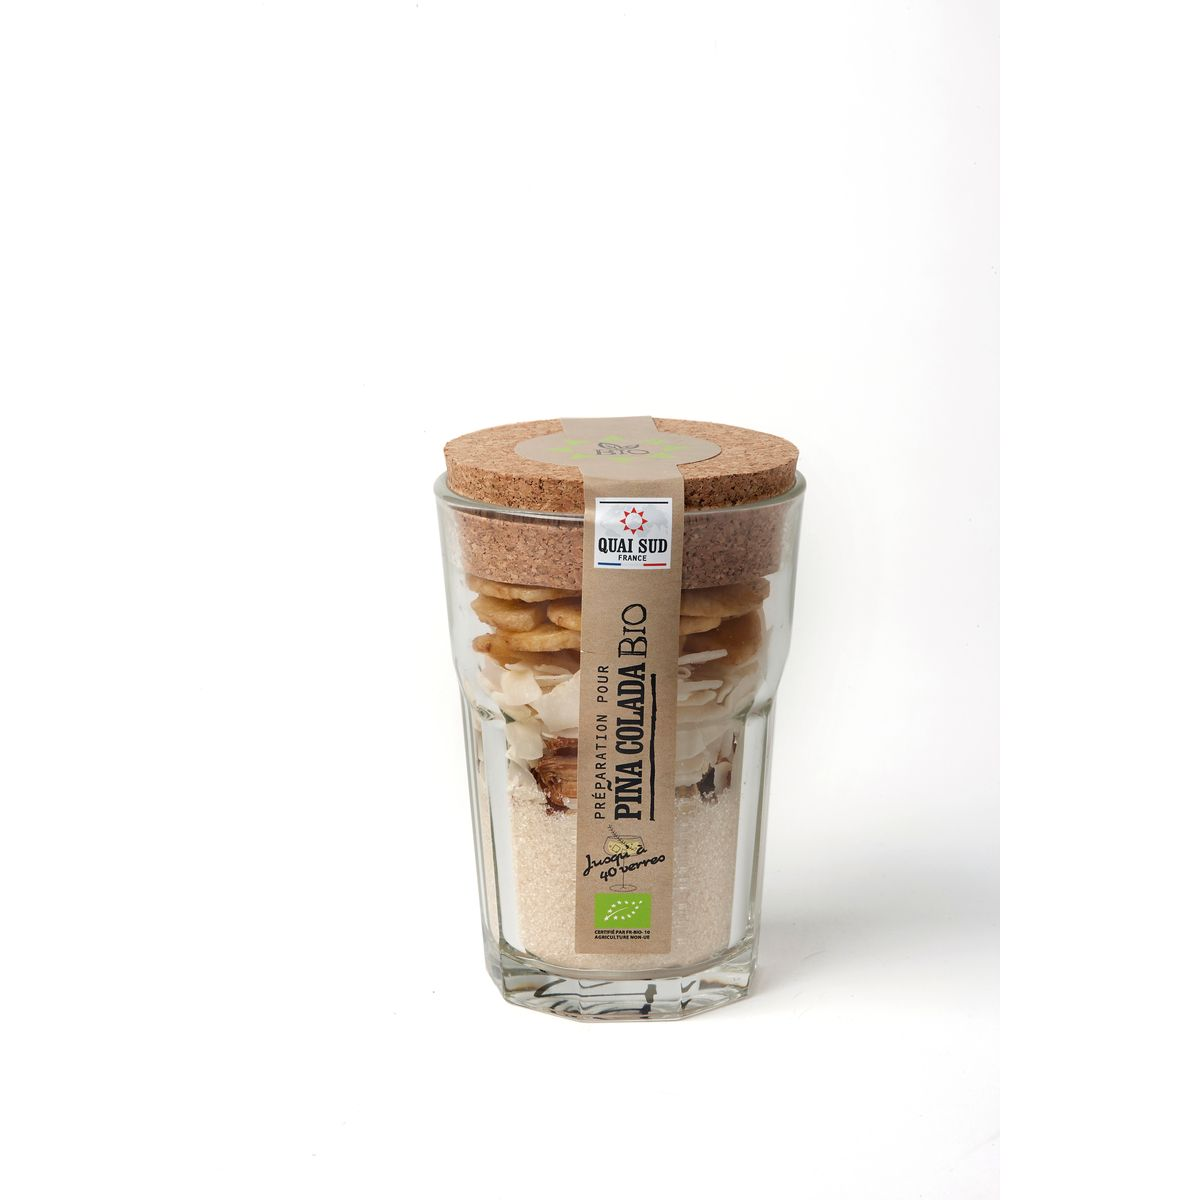 Mélange Bio pour Pina colada en verre à mojito 160g  - Quai Sud